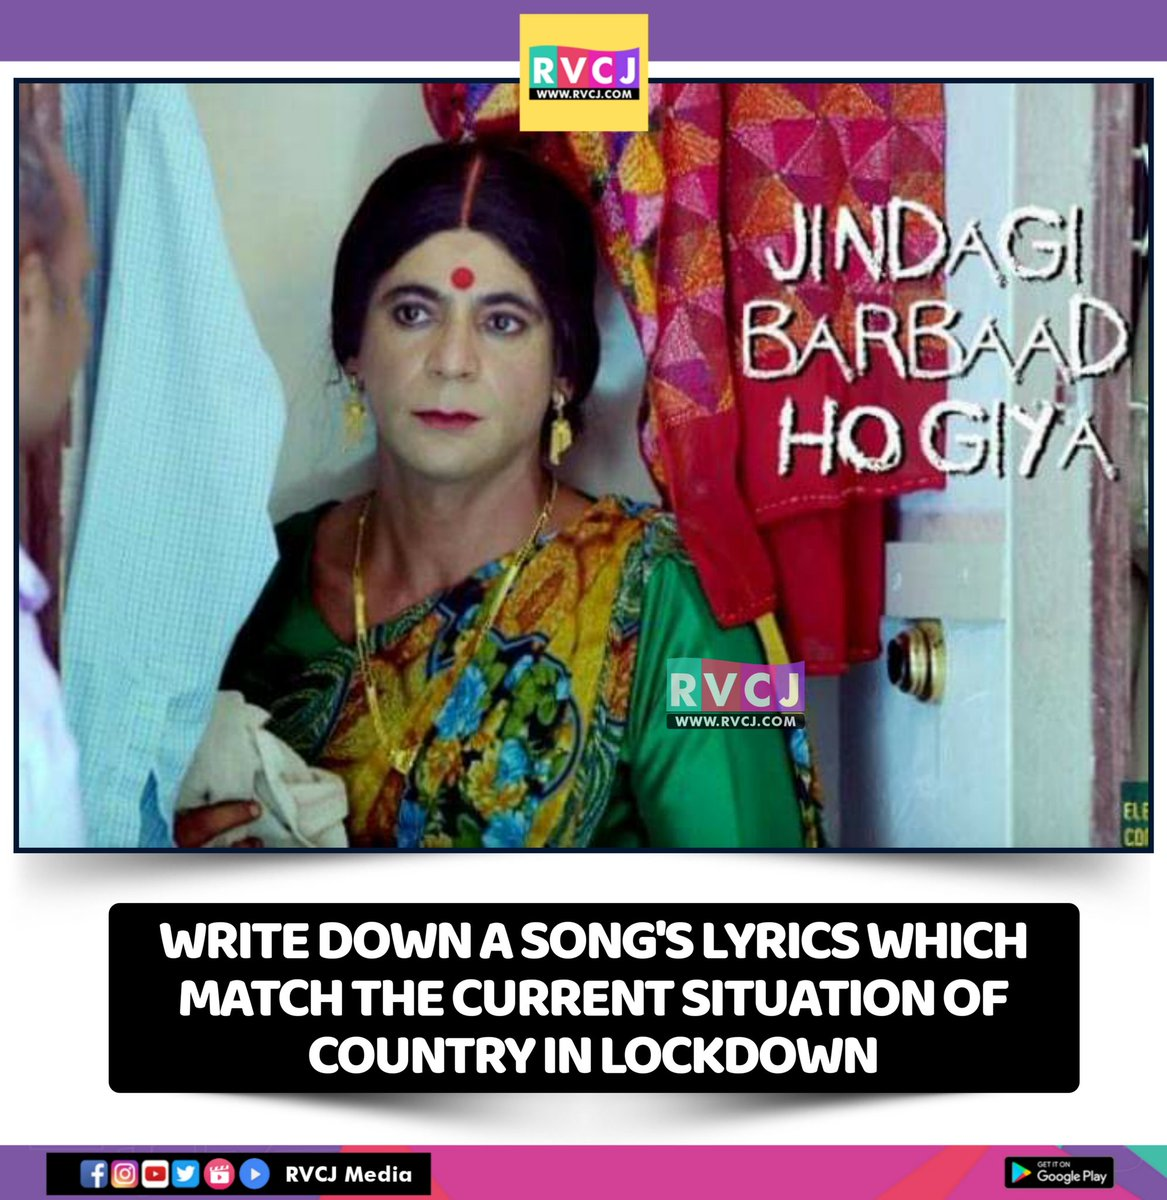 Write A Song Lyrics.. #lockdown #coronavirus #lockdown5 #unlock1 #songs #movies #rvcjmovies pic.twitter.com/A7b65WpRHT